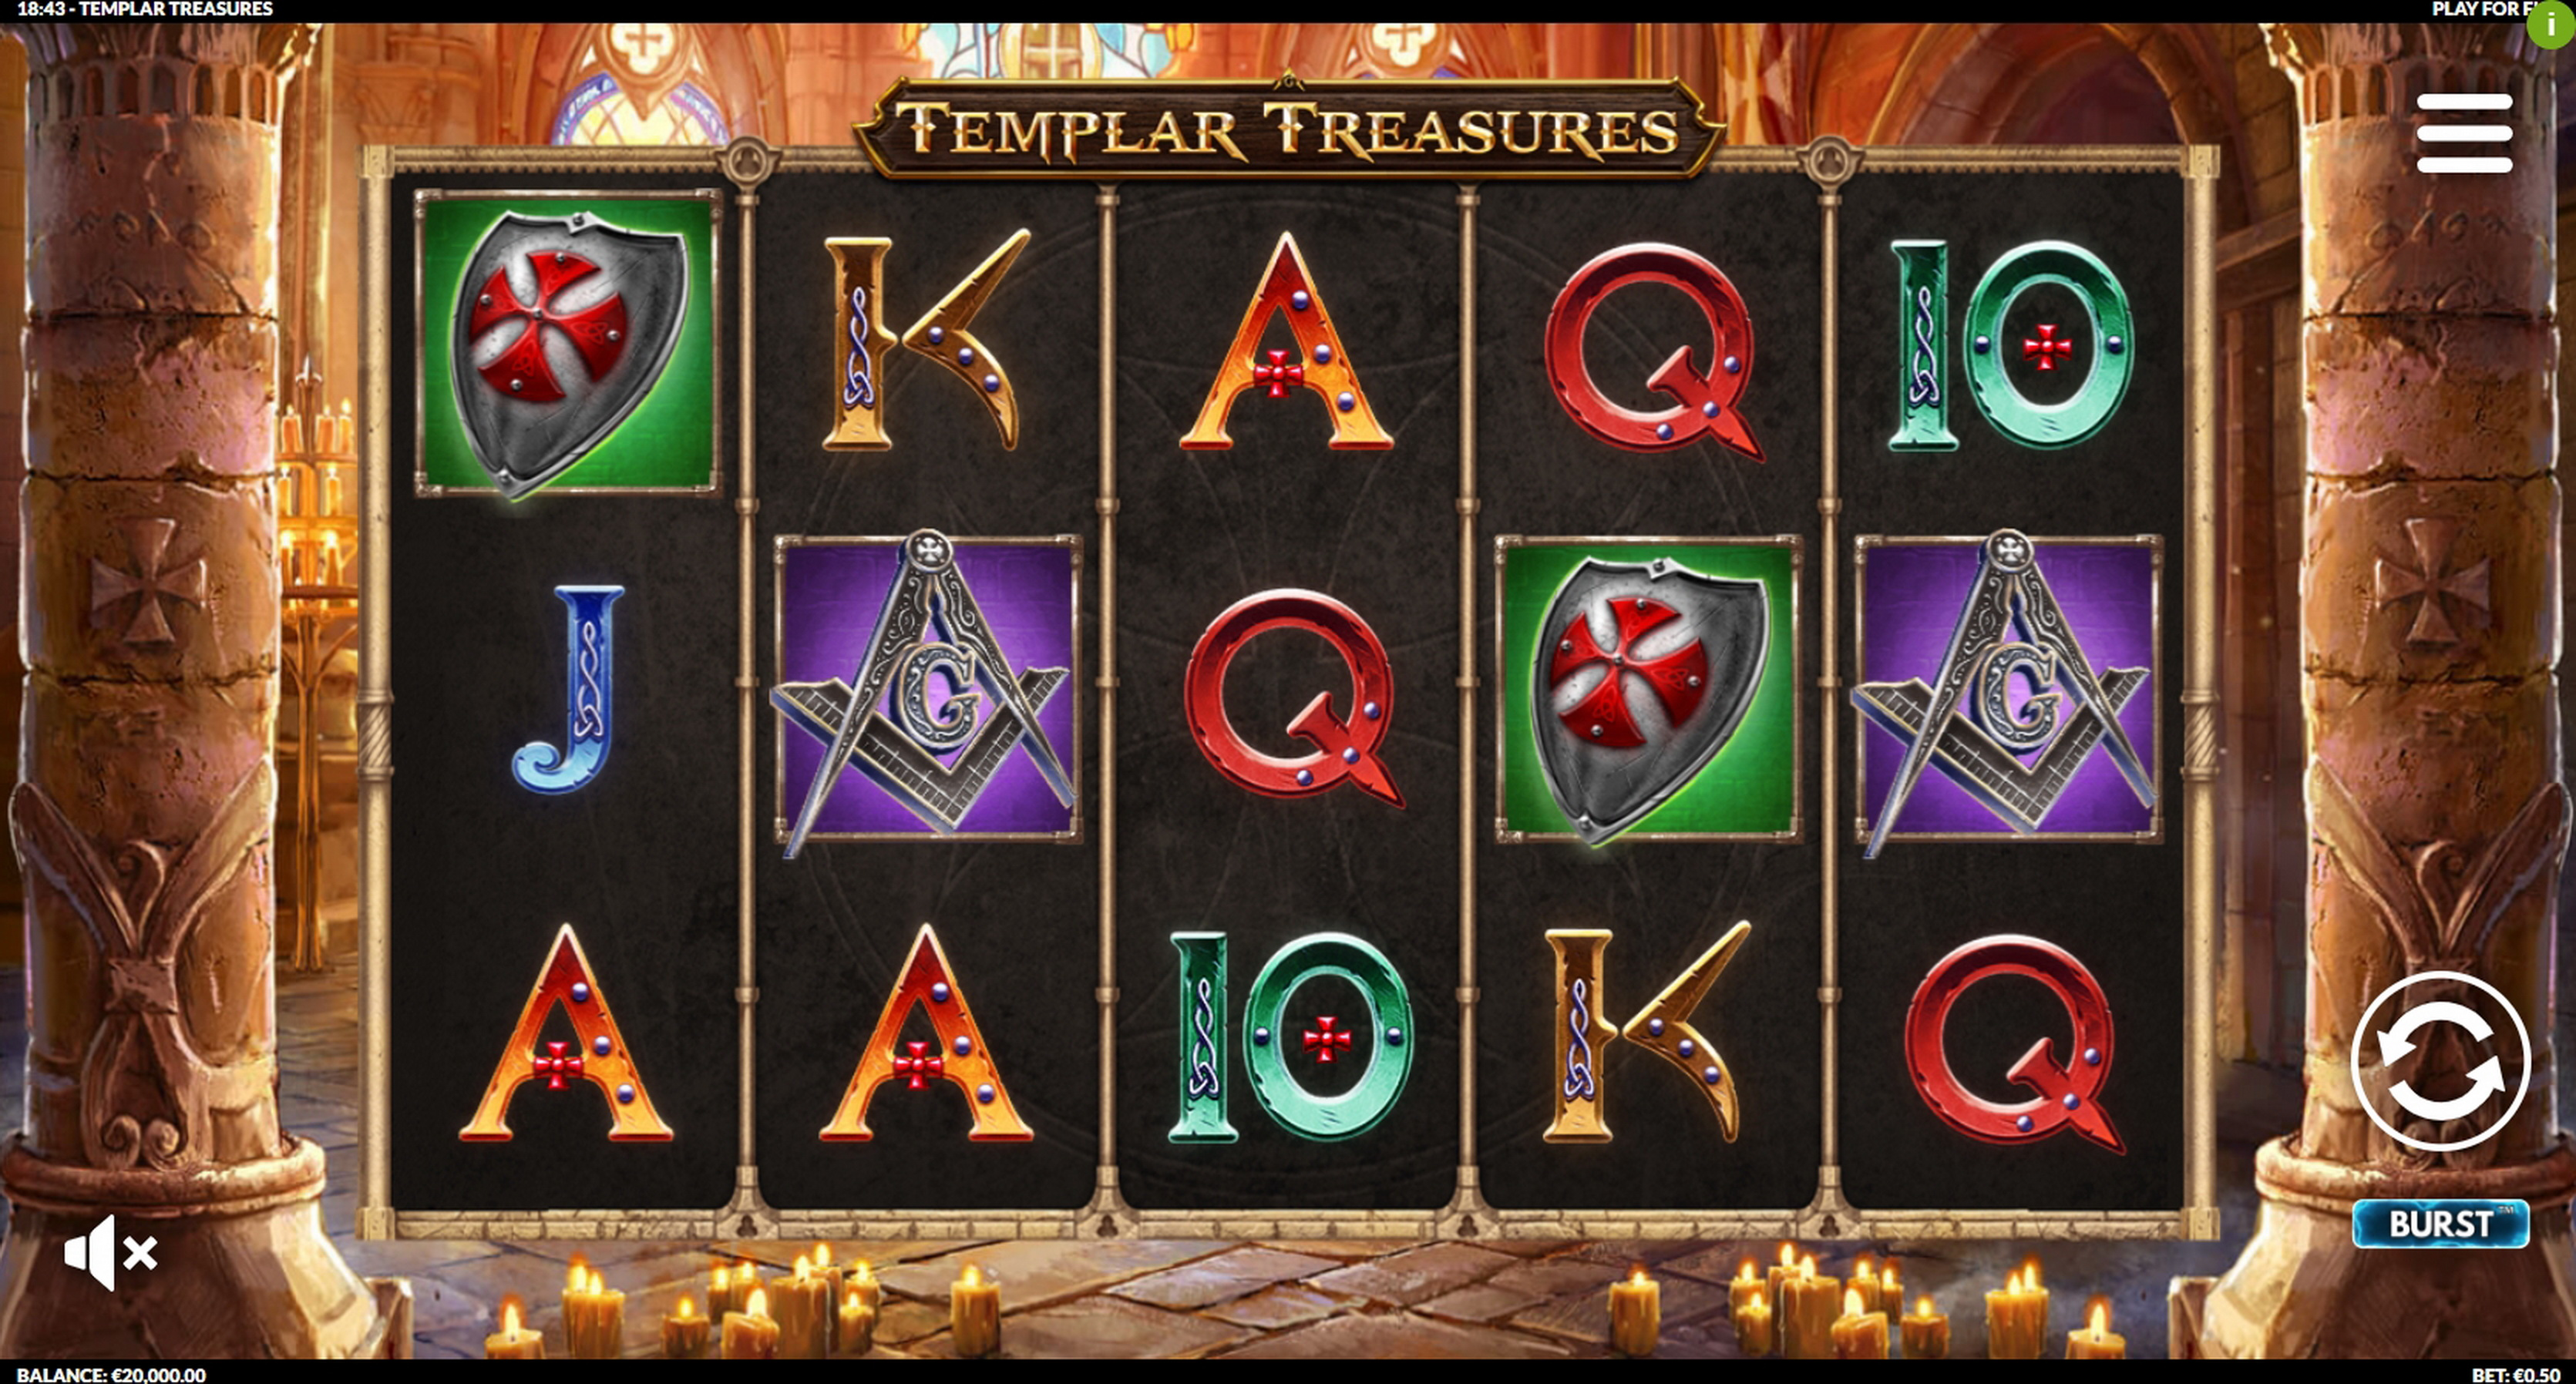 Treasures of Egypt Slot Machine